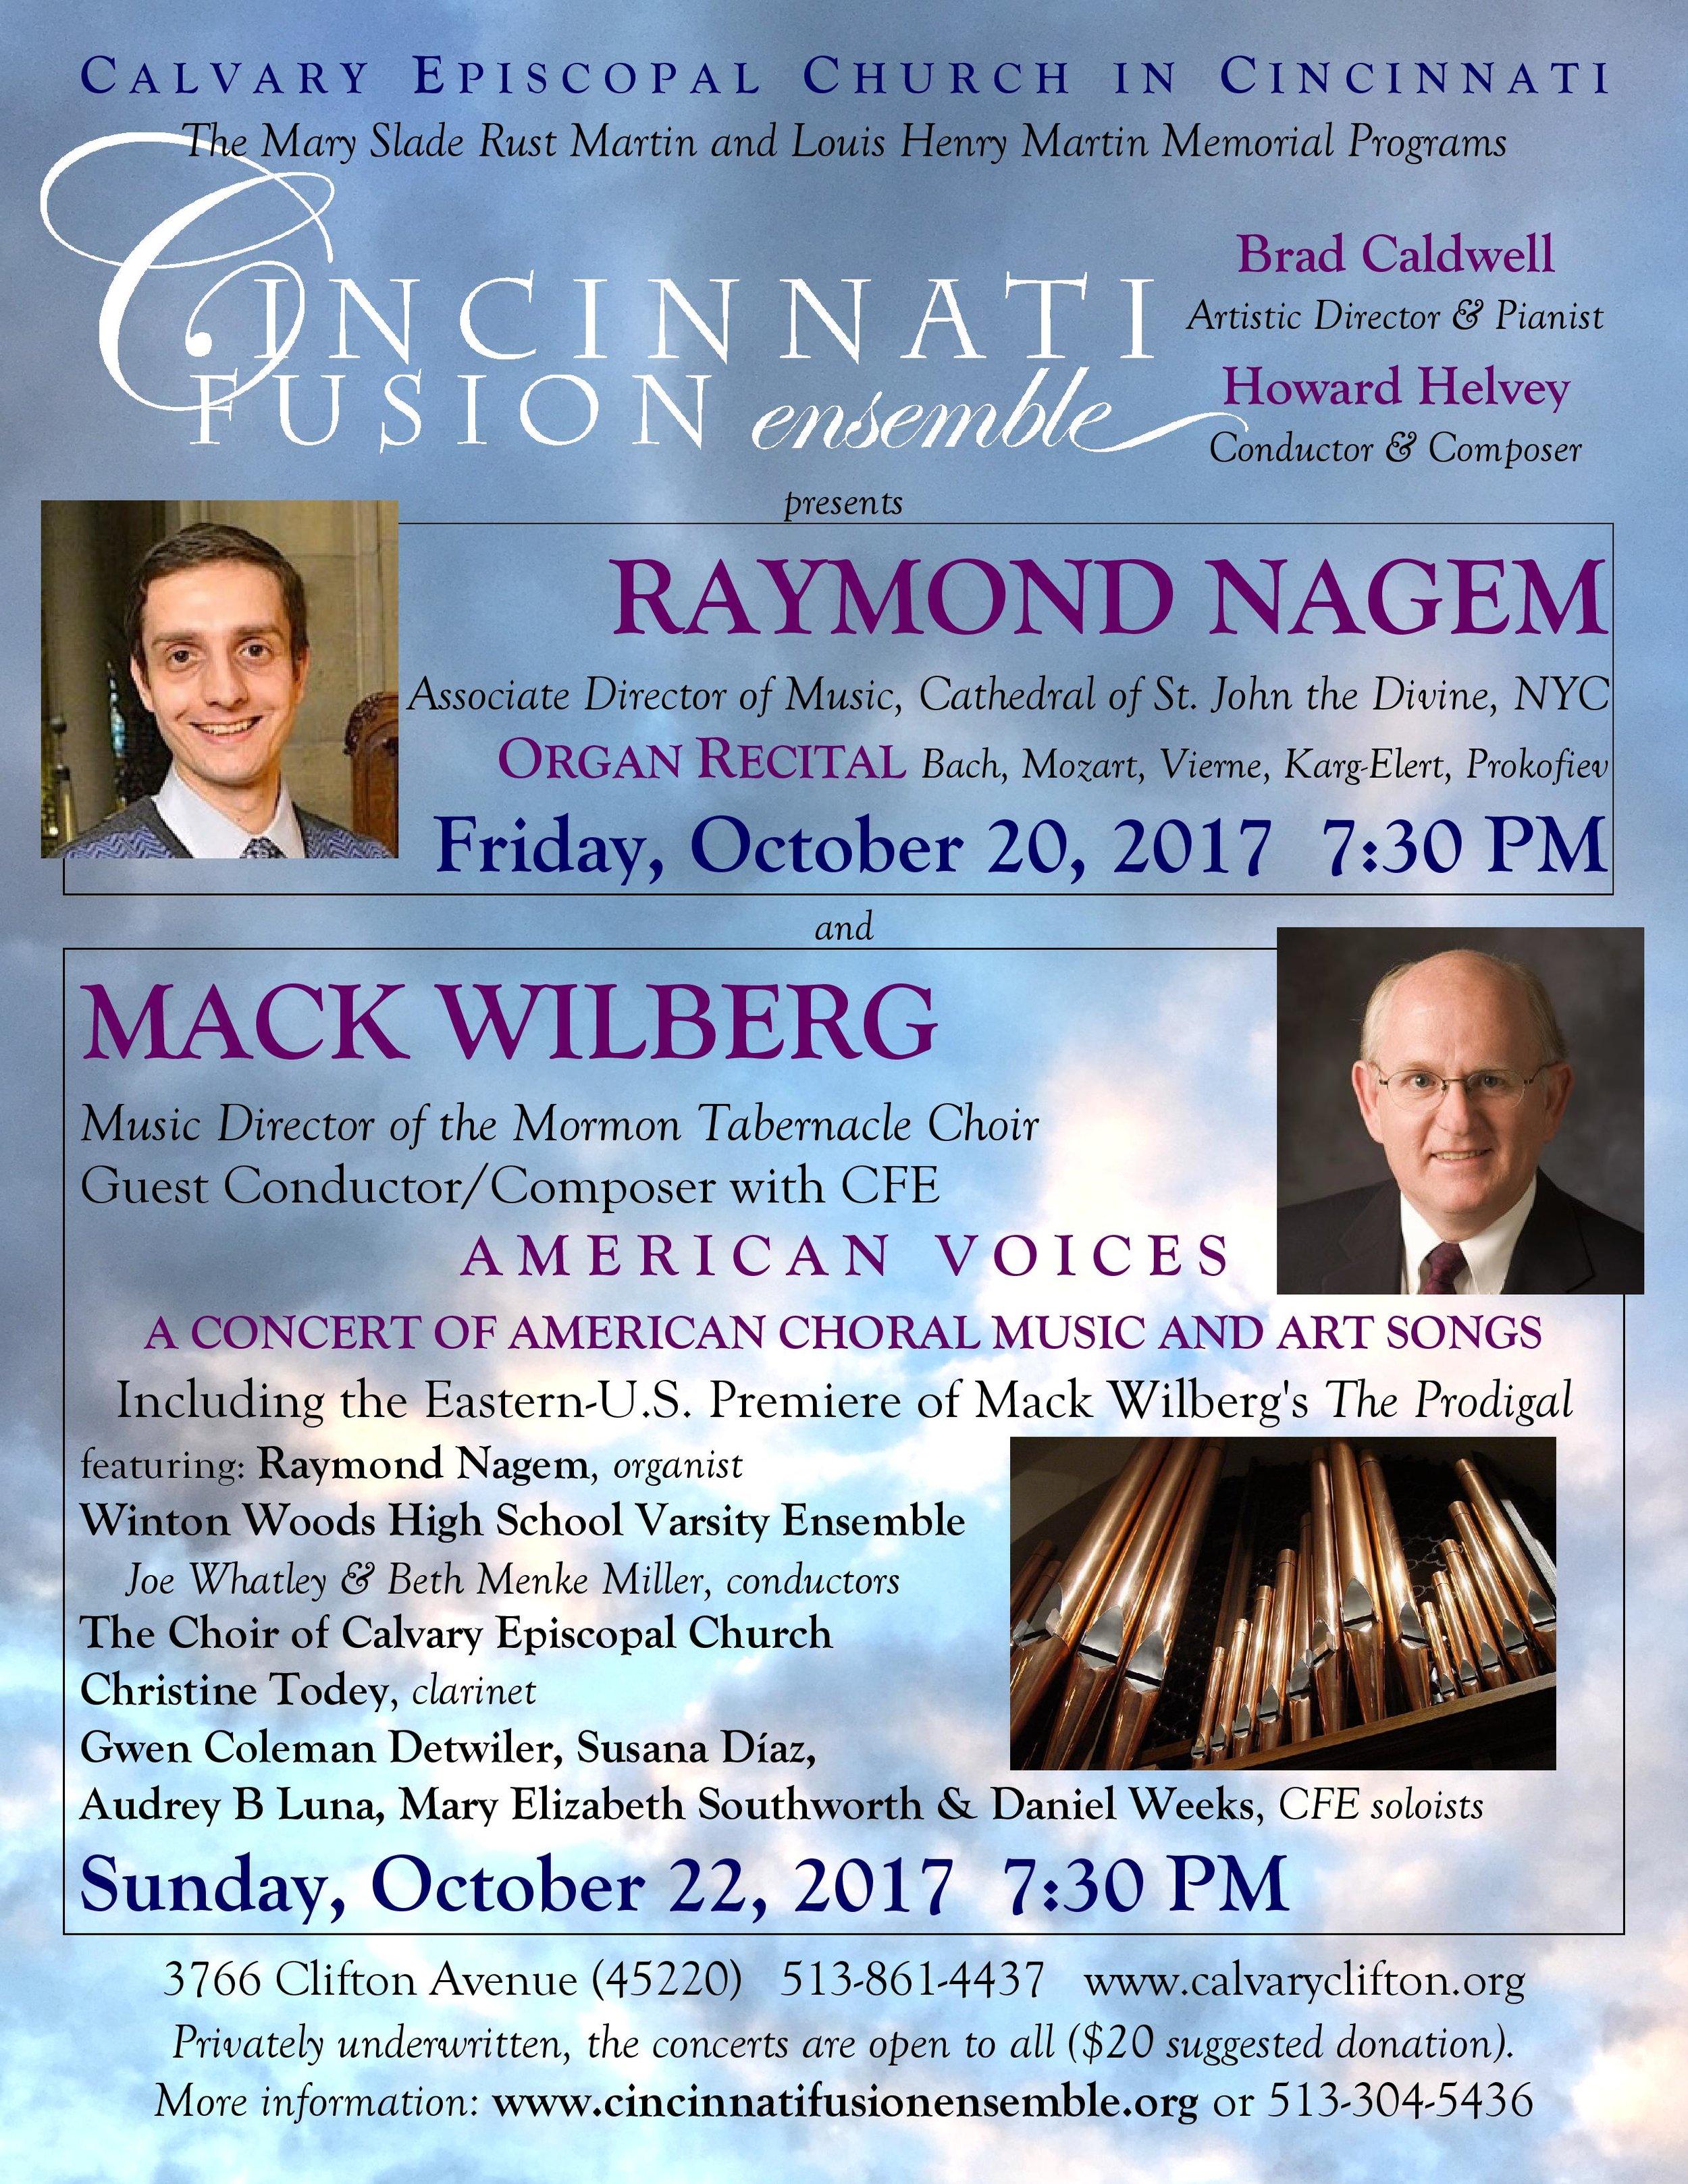 - 7:30 pm each eveningat Calvary Episcopal Church3766 Clifton Ave, Cincinnati, 45220Read about Raymond Nagem and Mack Wilberg.